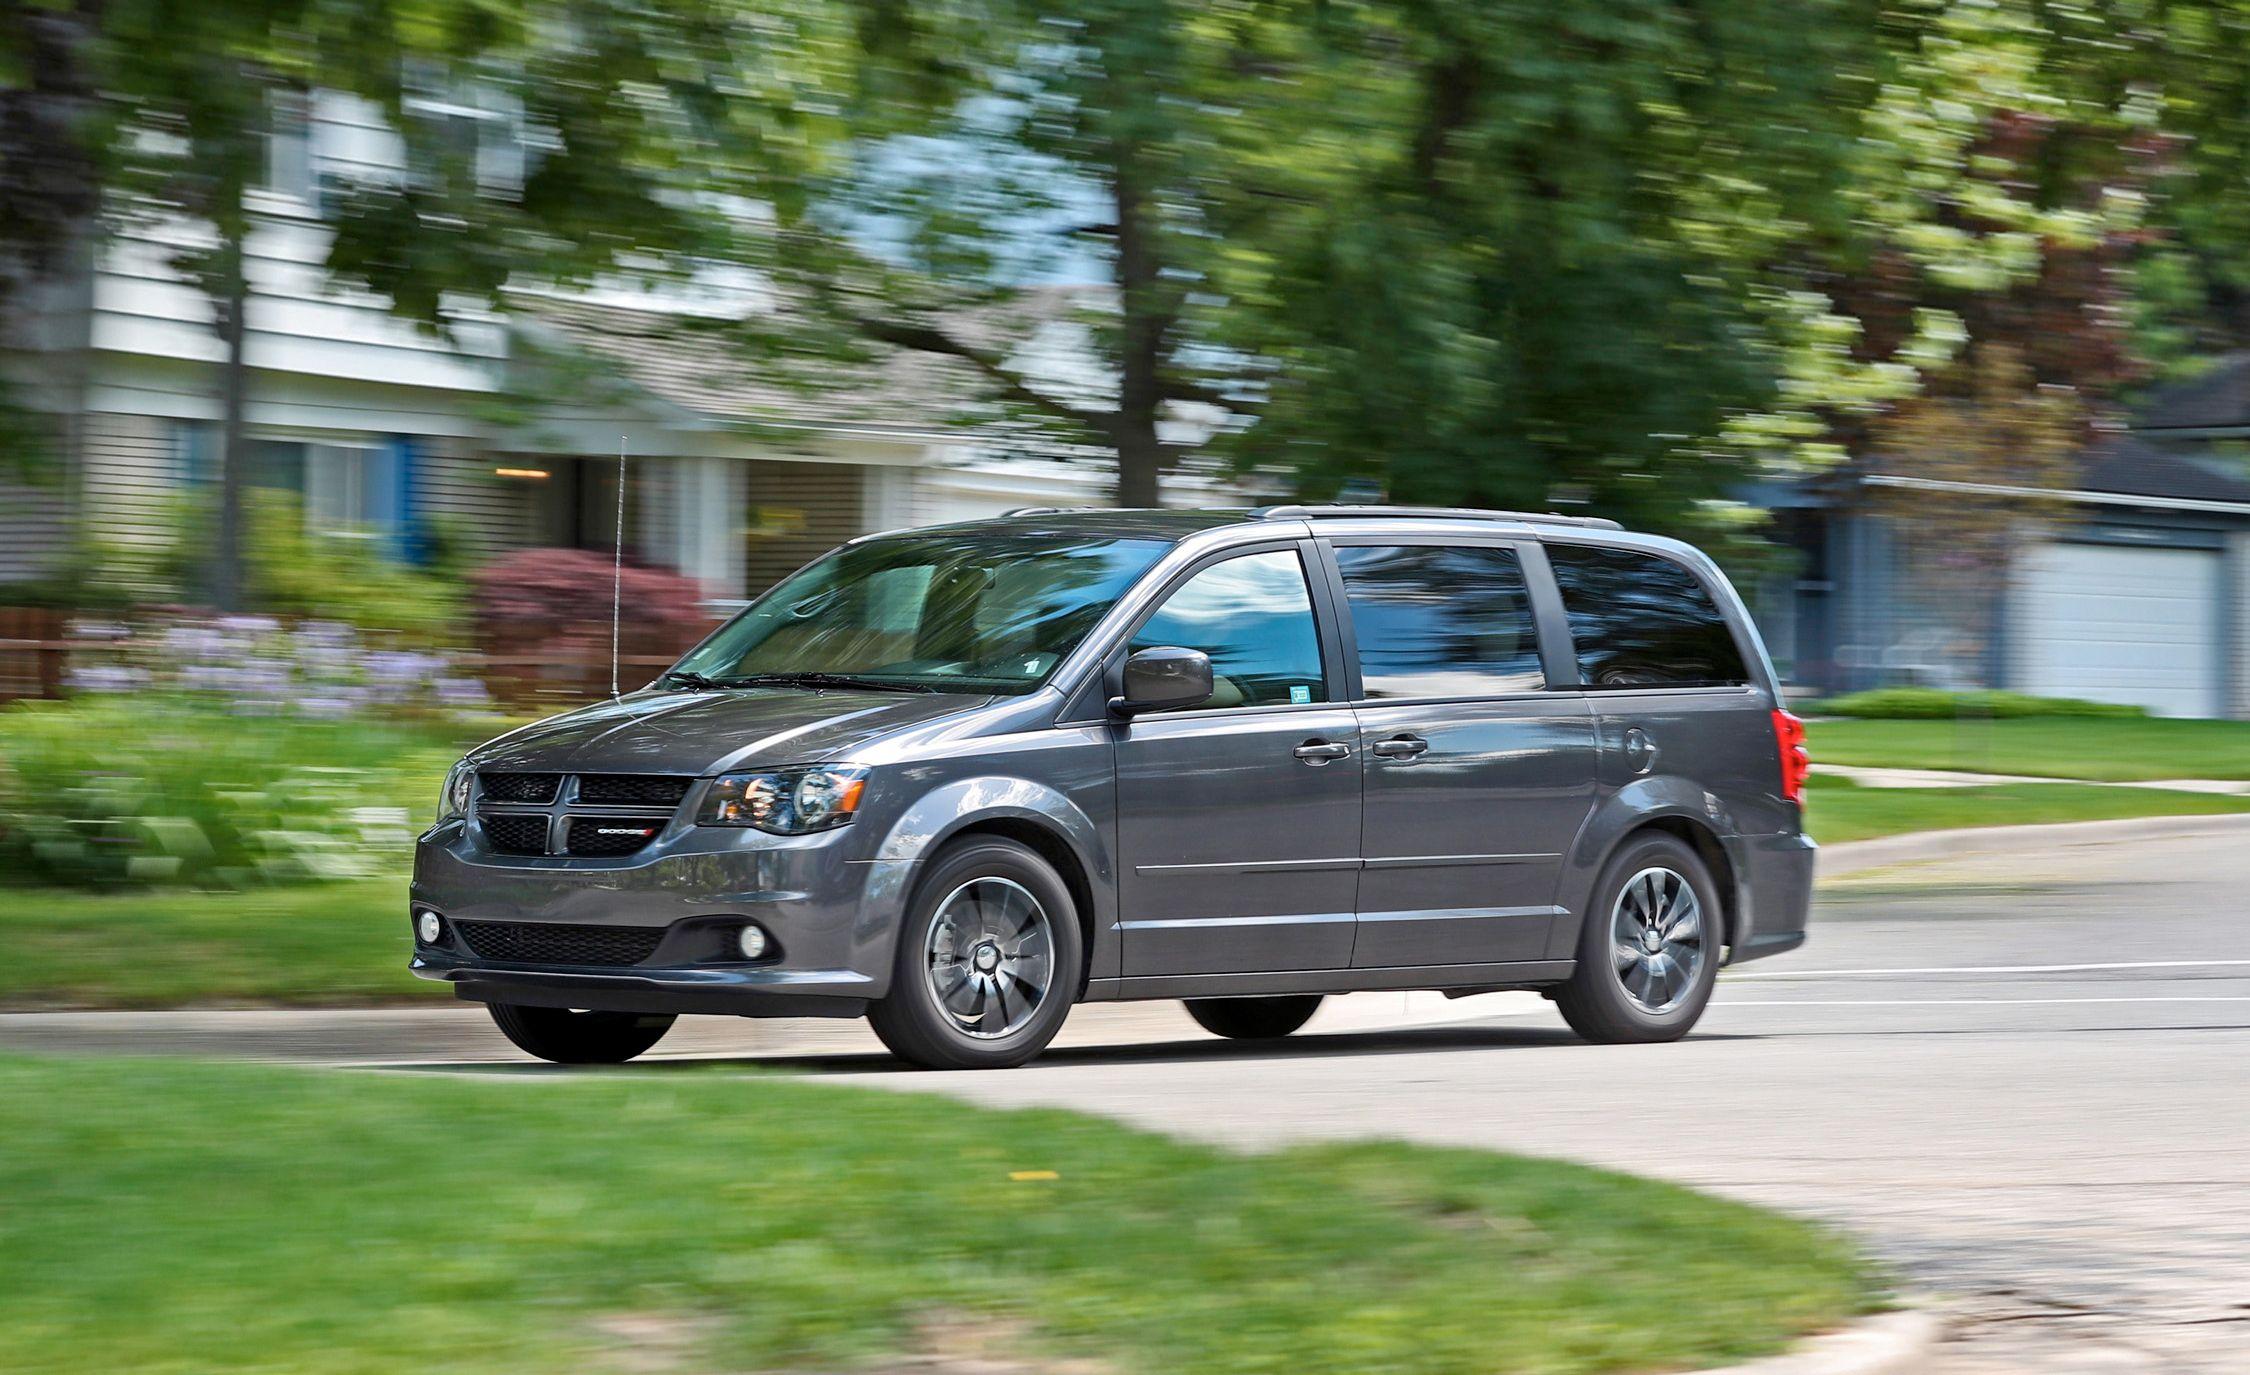 2019 Dodge Grand Caravan Reviews | Dodge Grand Caravan Price, Photos, and  Specs | Car and Driver